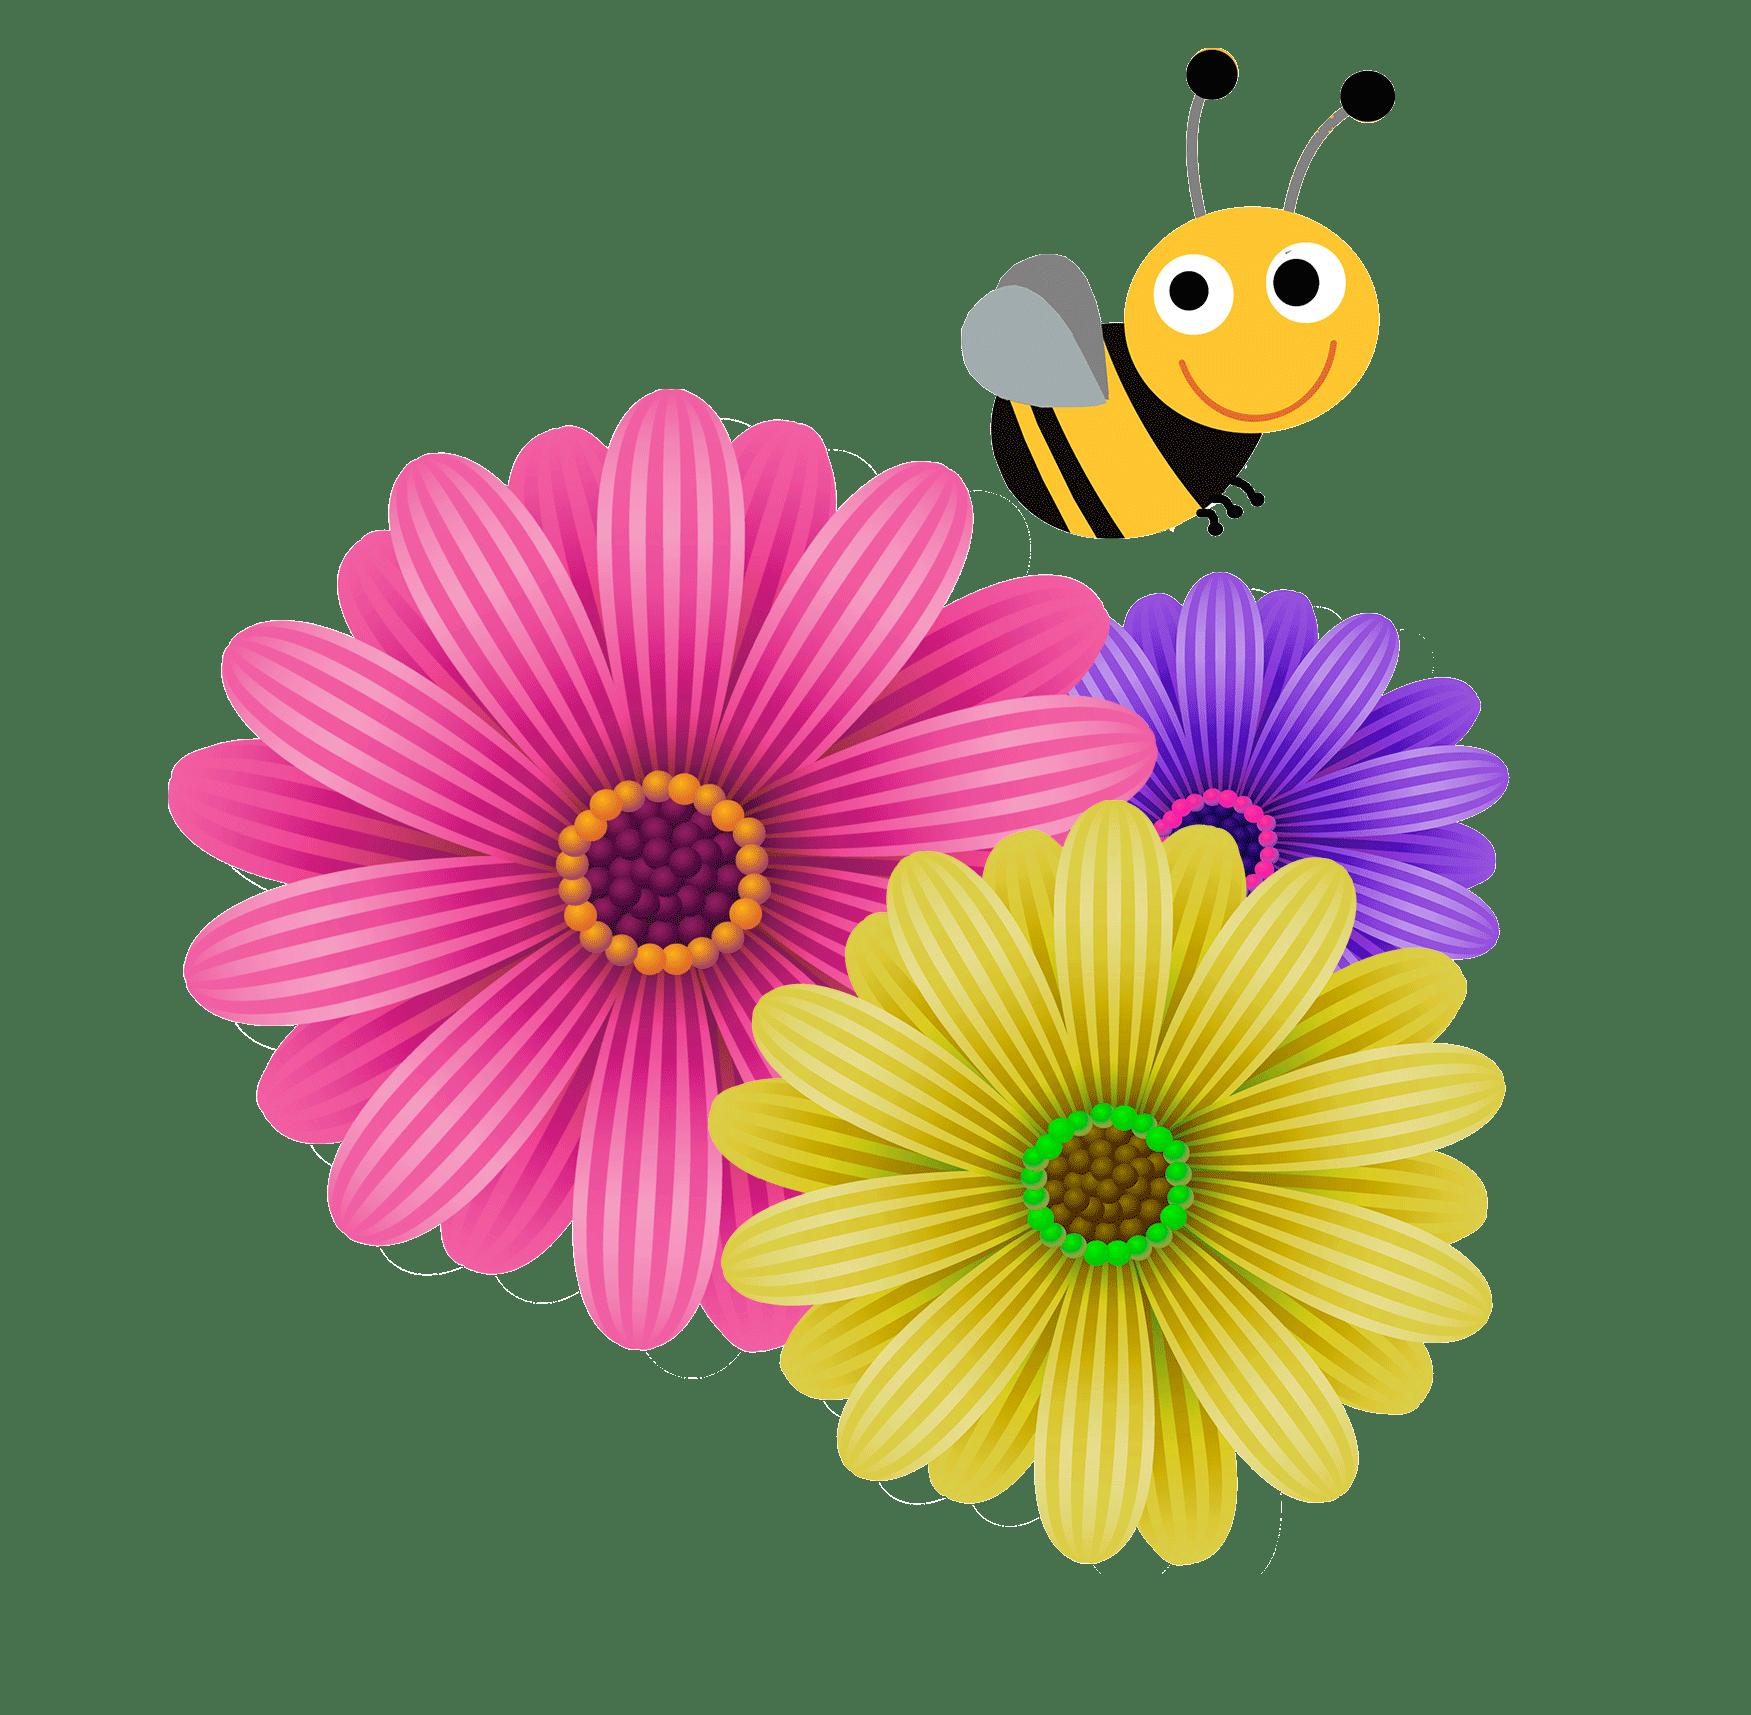 floral corner design png Google Search flowers Pinterest